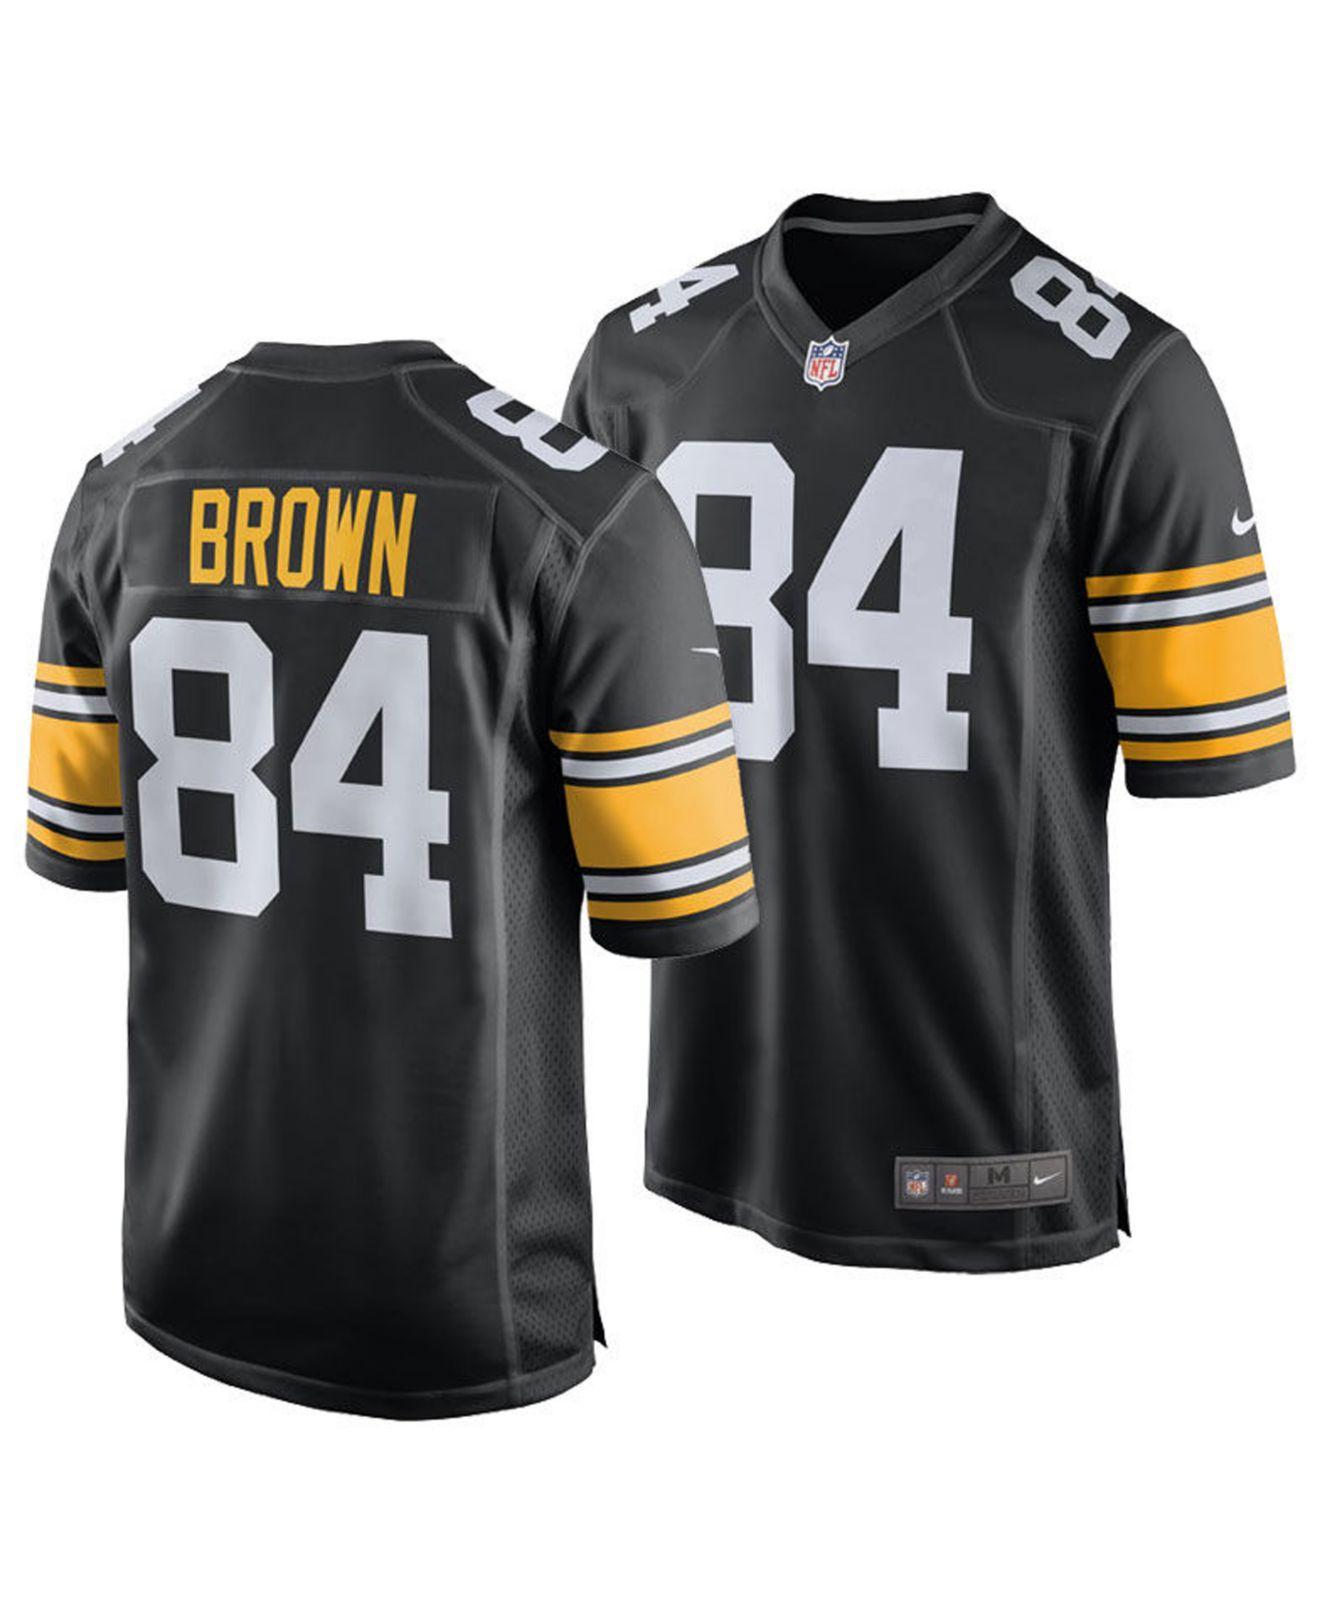 6e2b07c45a5 Lyst - Nike Antonio Brown Pittsburgh Steelers Game Jersey in Black ...